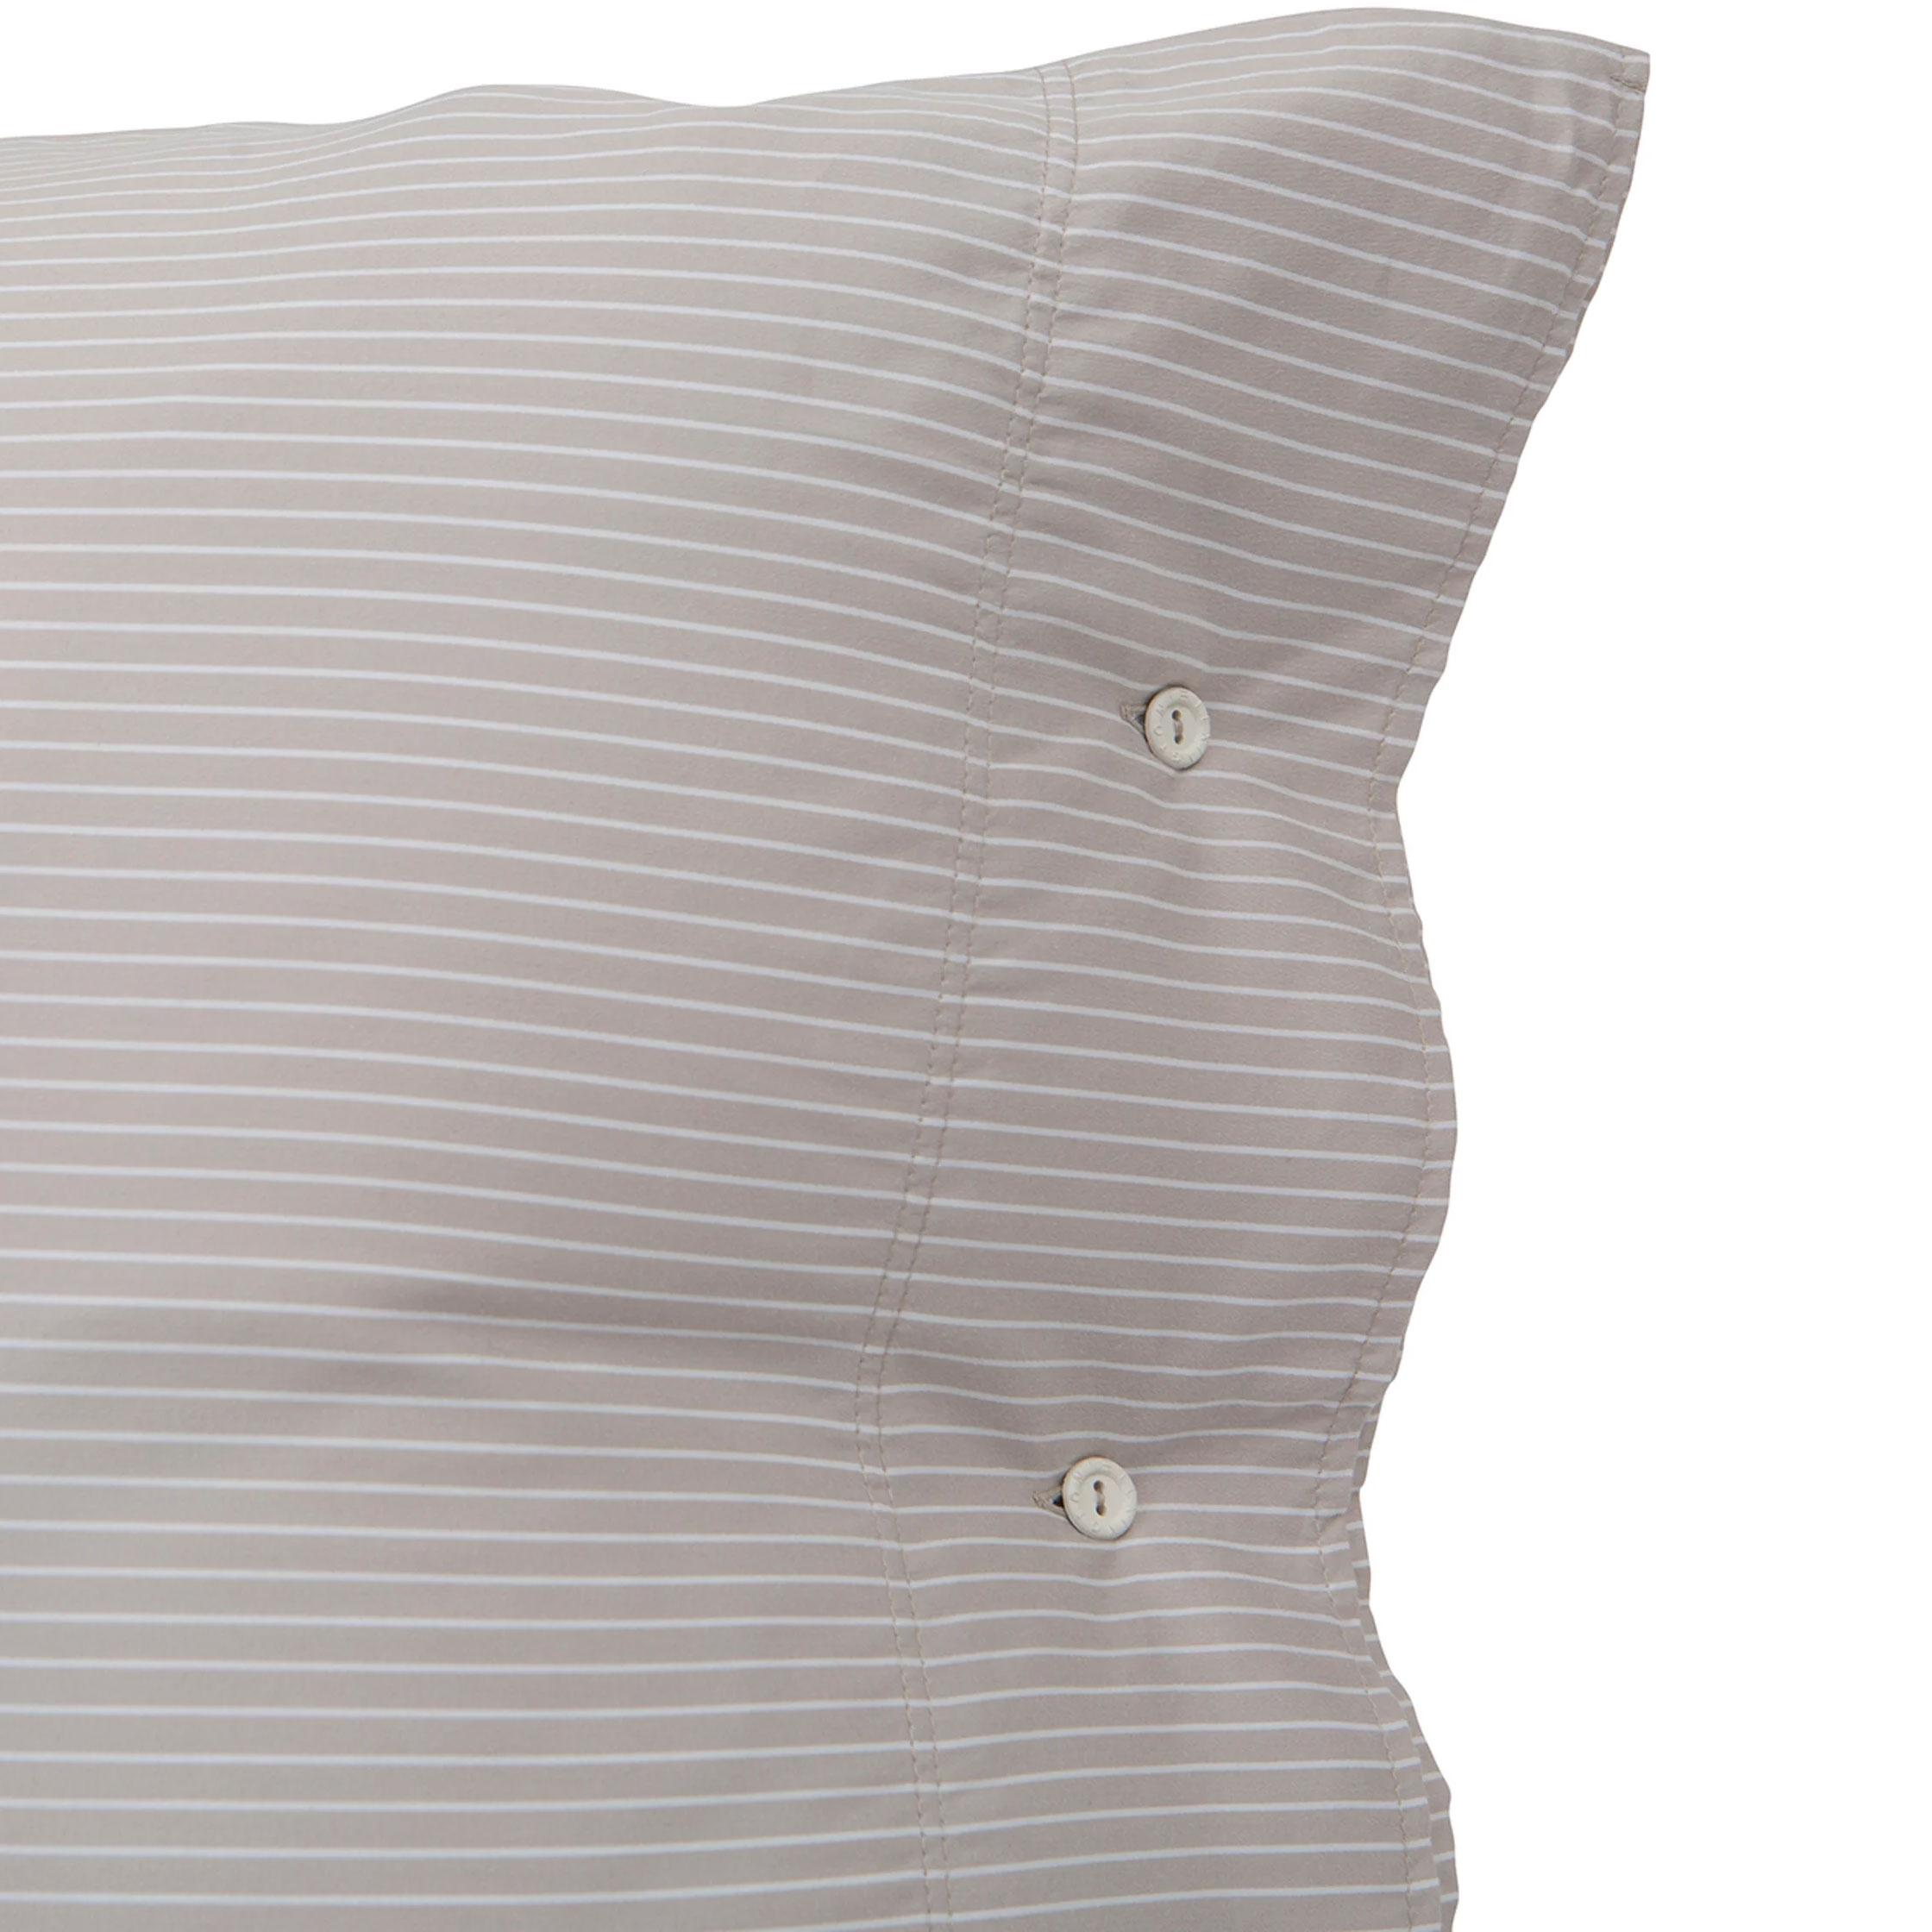 Hotel Tencel Stripe Pillowcase 65x65 cm, Beige/White